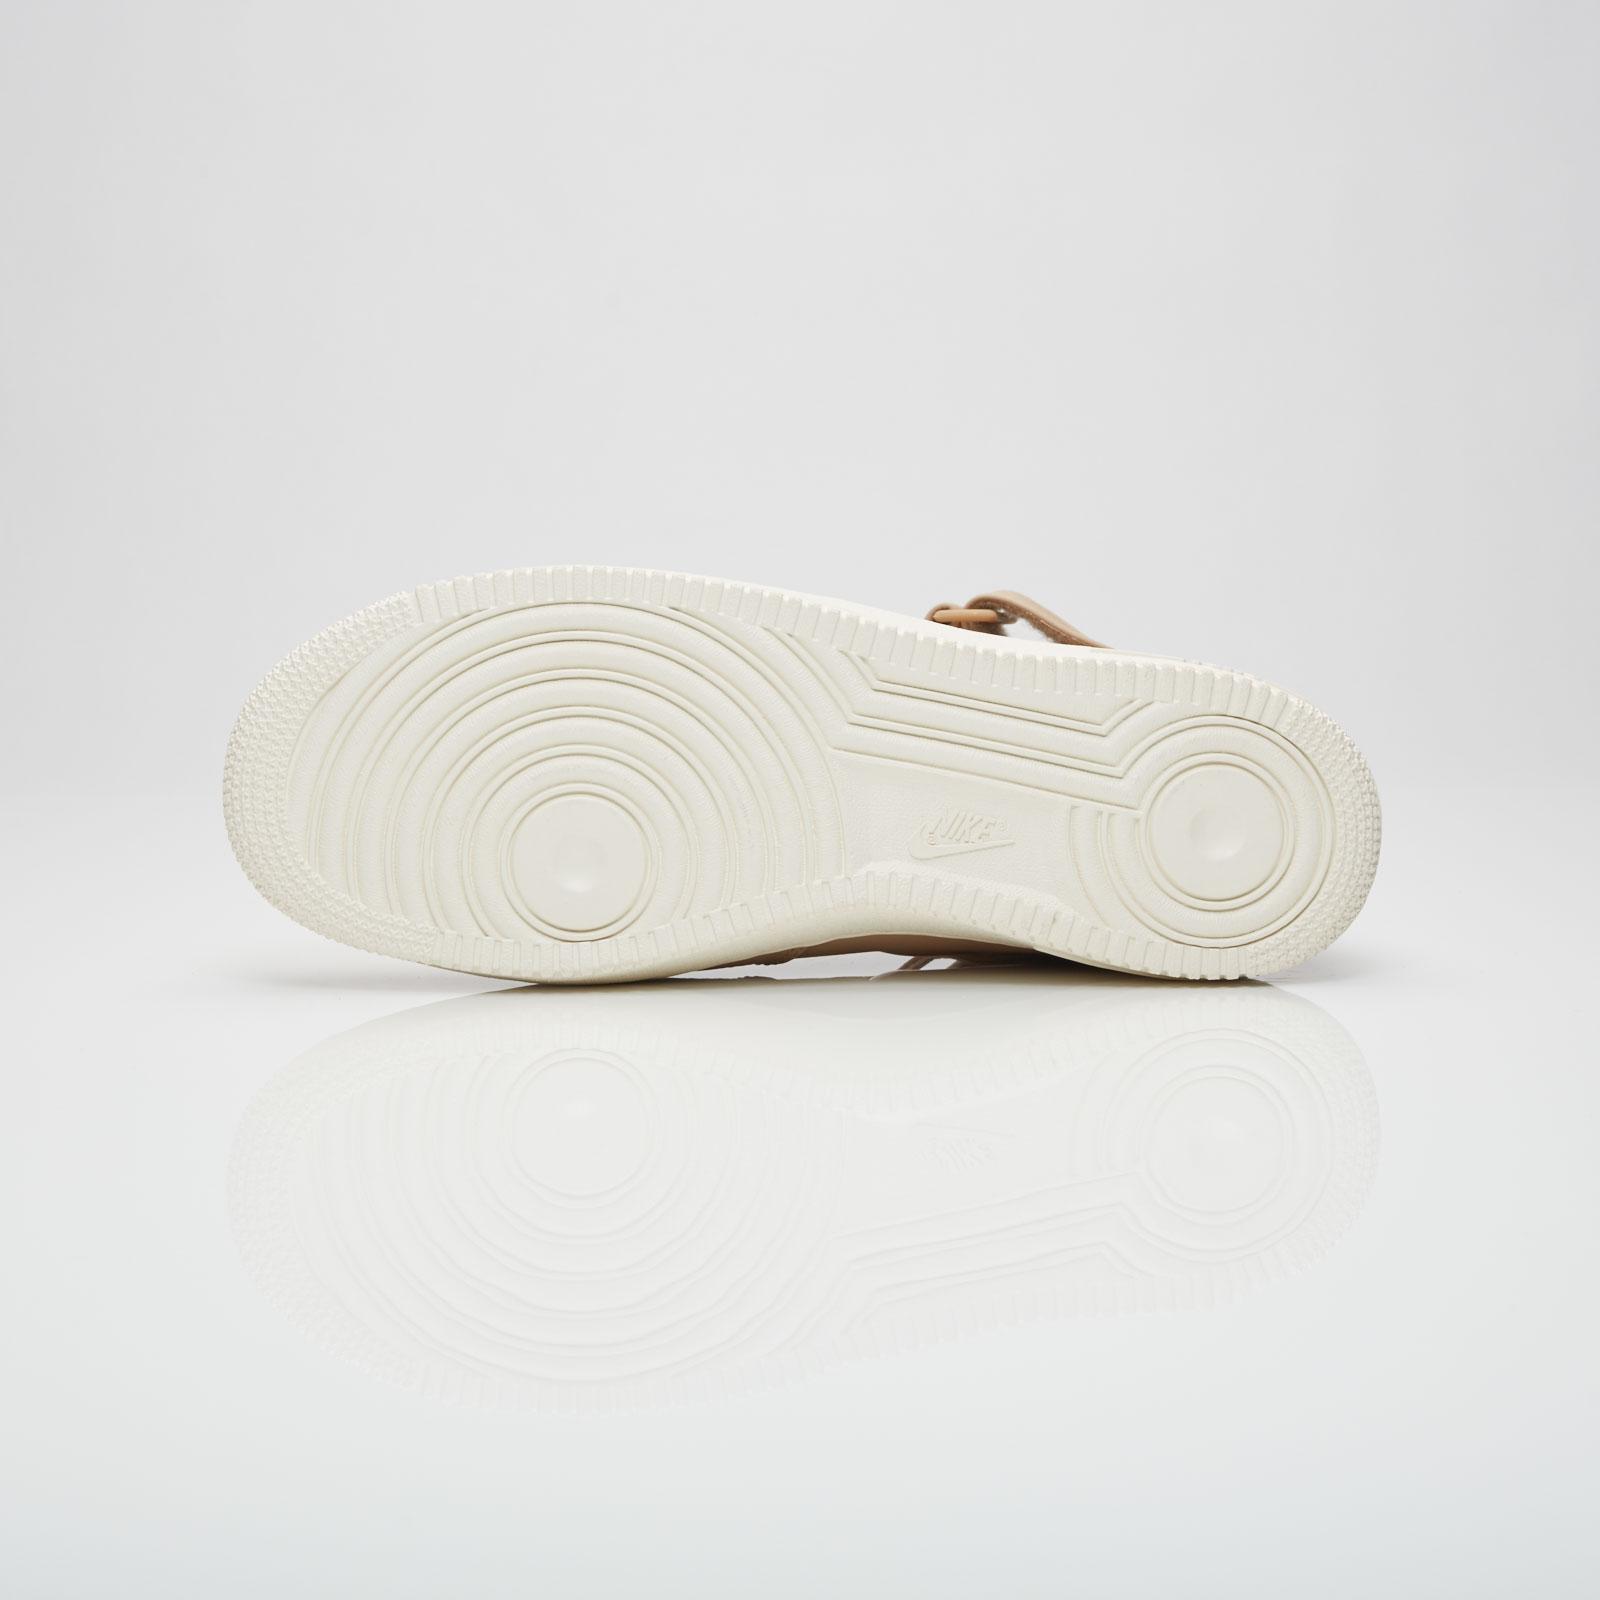 Nike Air Force 1 Mid Retro Premium - 941913-200 - Sneakersnstuff ... 630a00f4f5